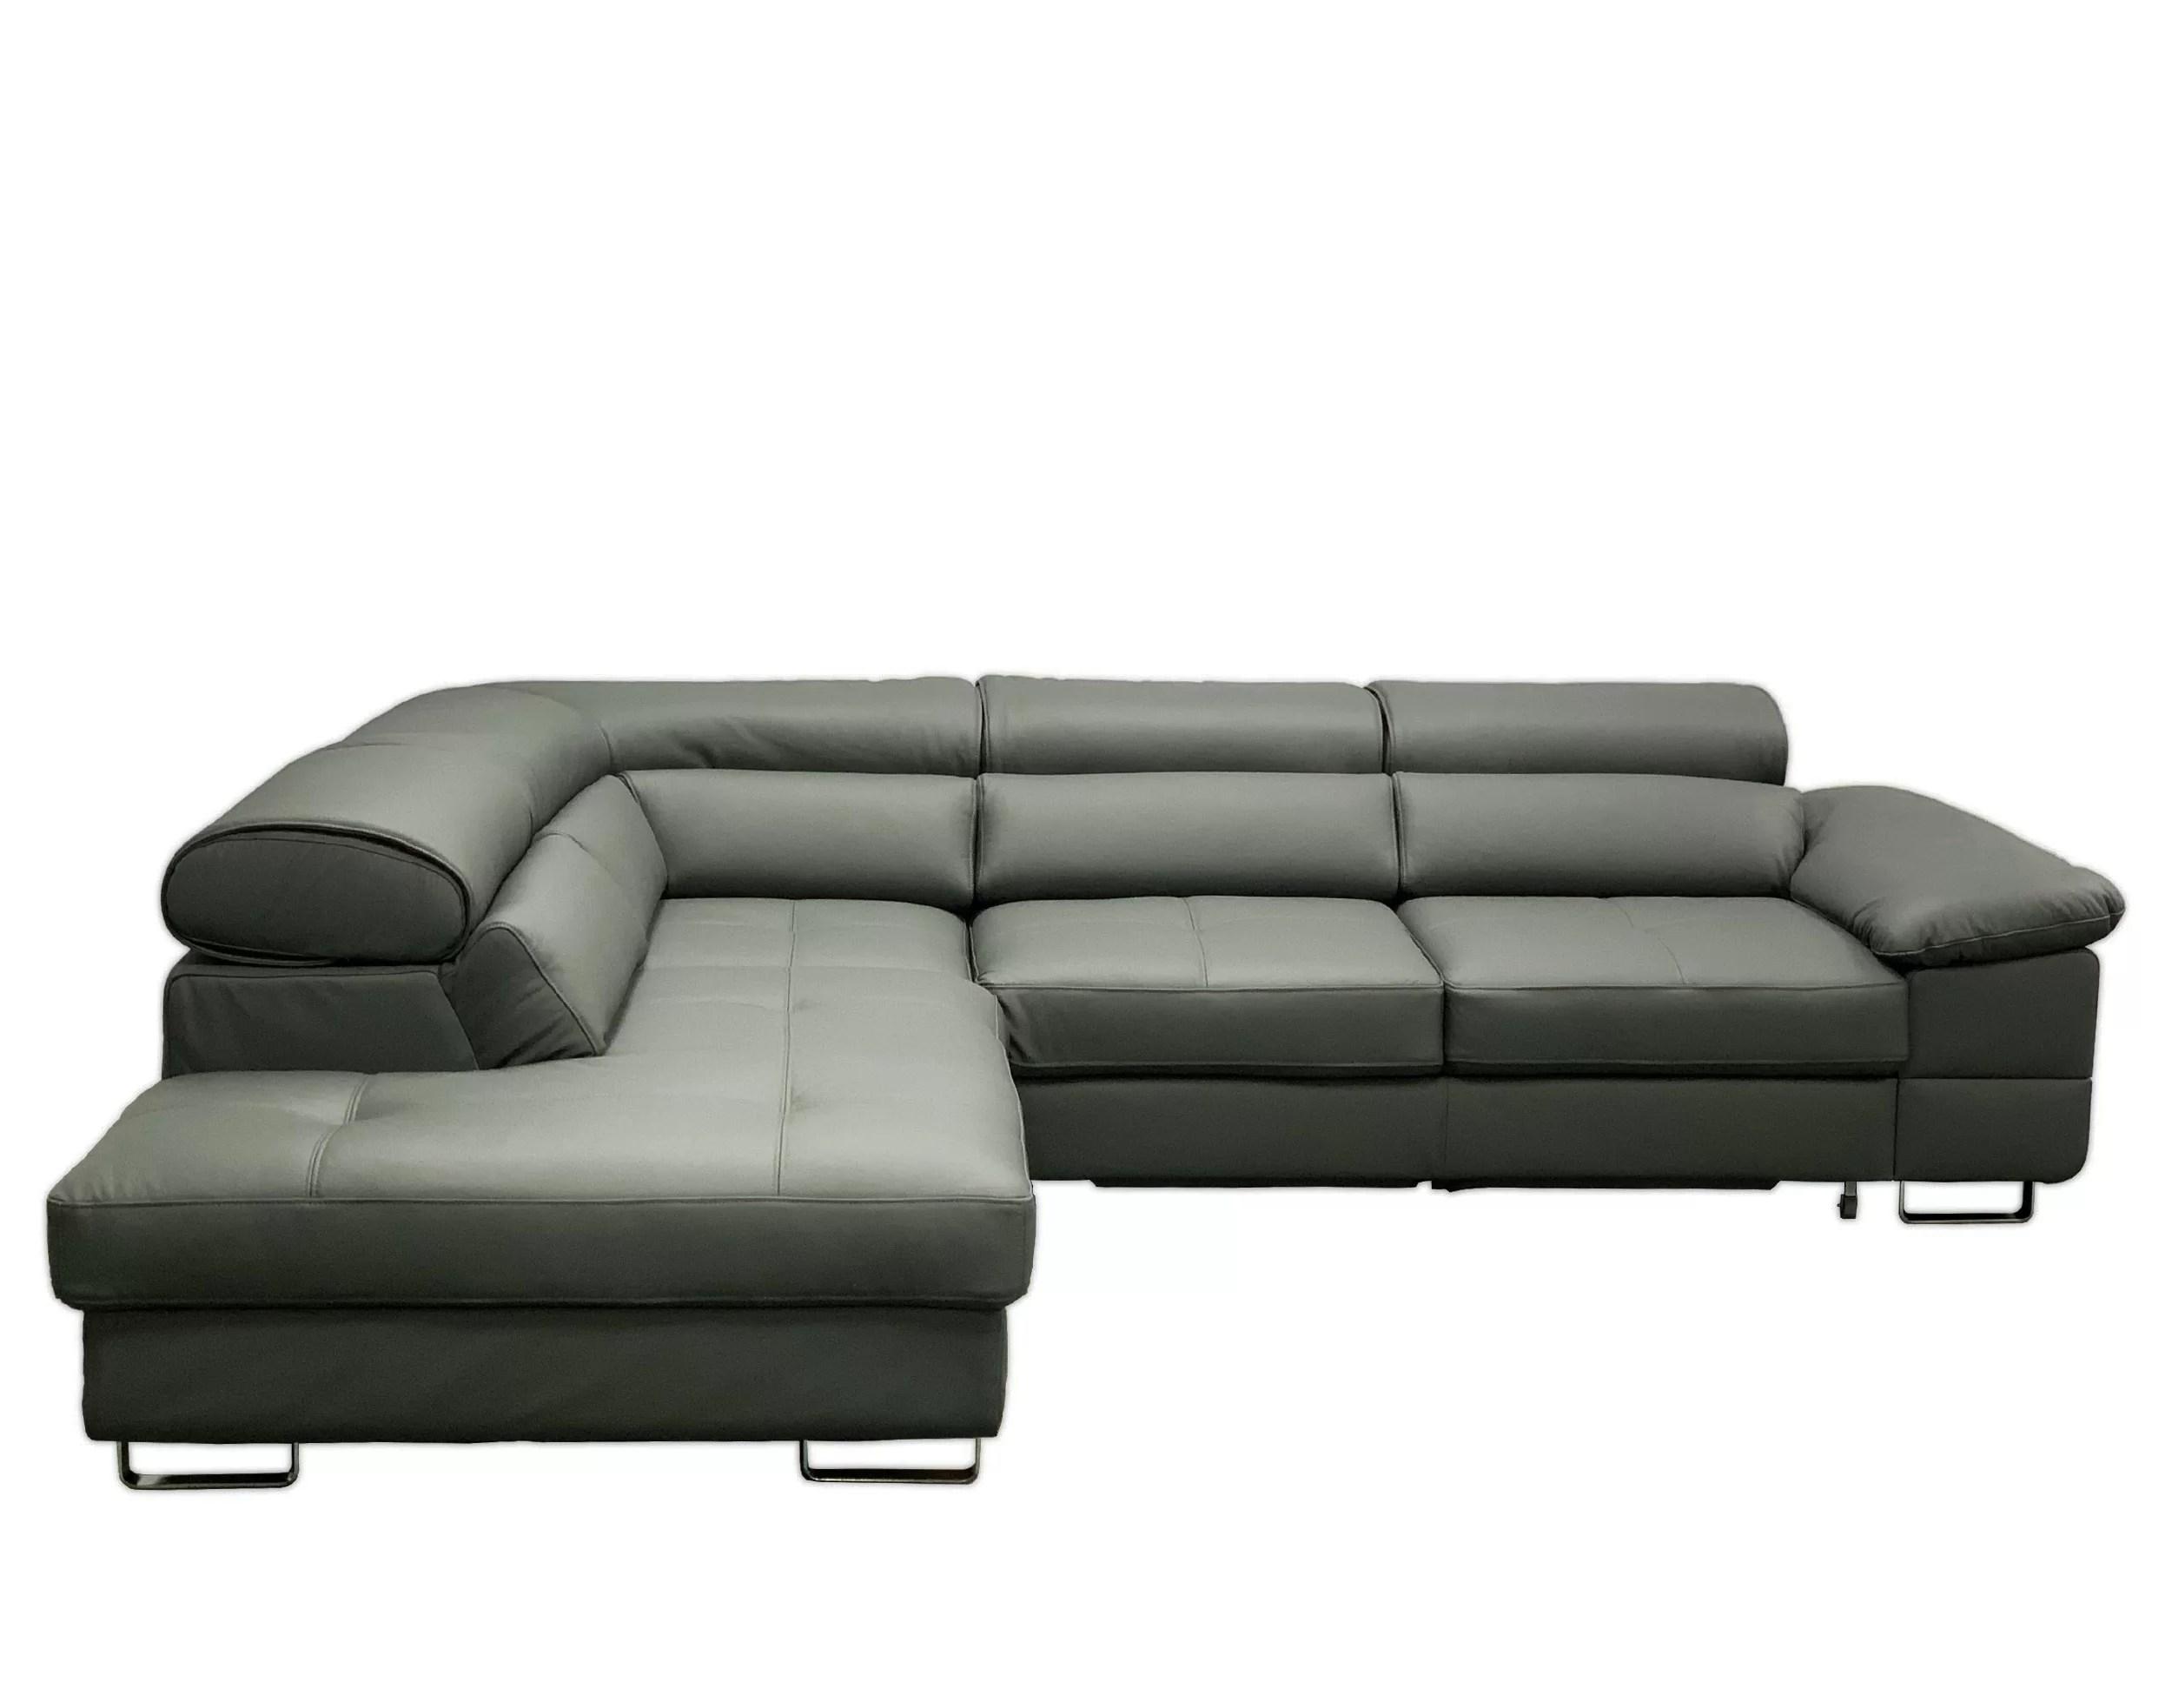 Orren Ellis Teillon 112 Genuine Leather Sleeper Sofa Chaise Wayfair